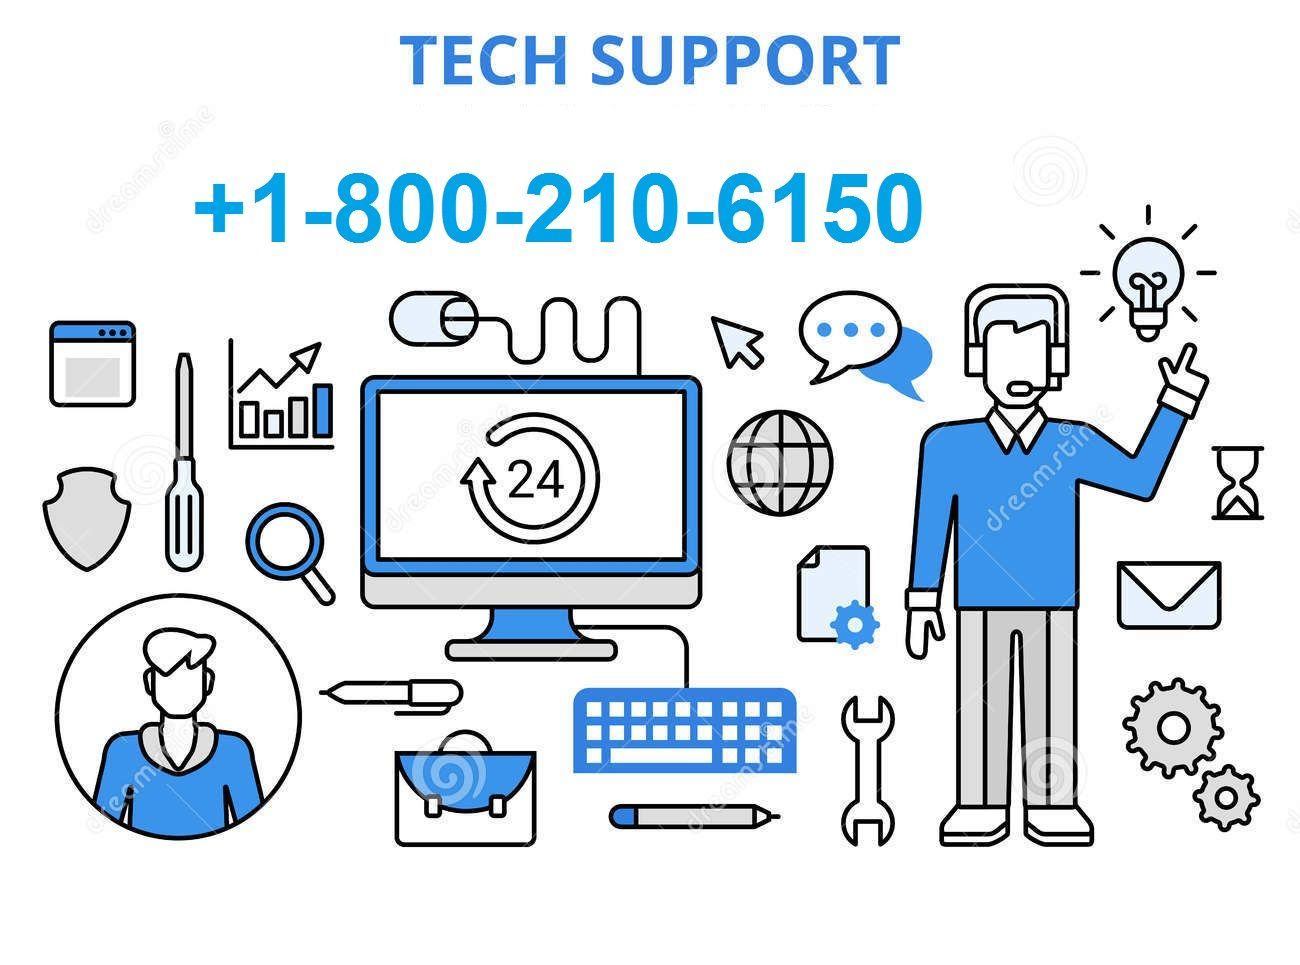 Verizon Email Customer Support +18558554384 Phone